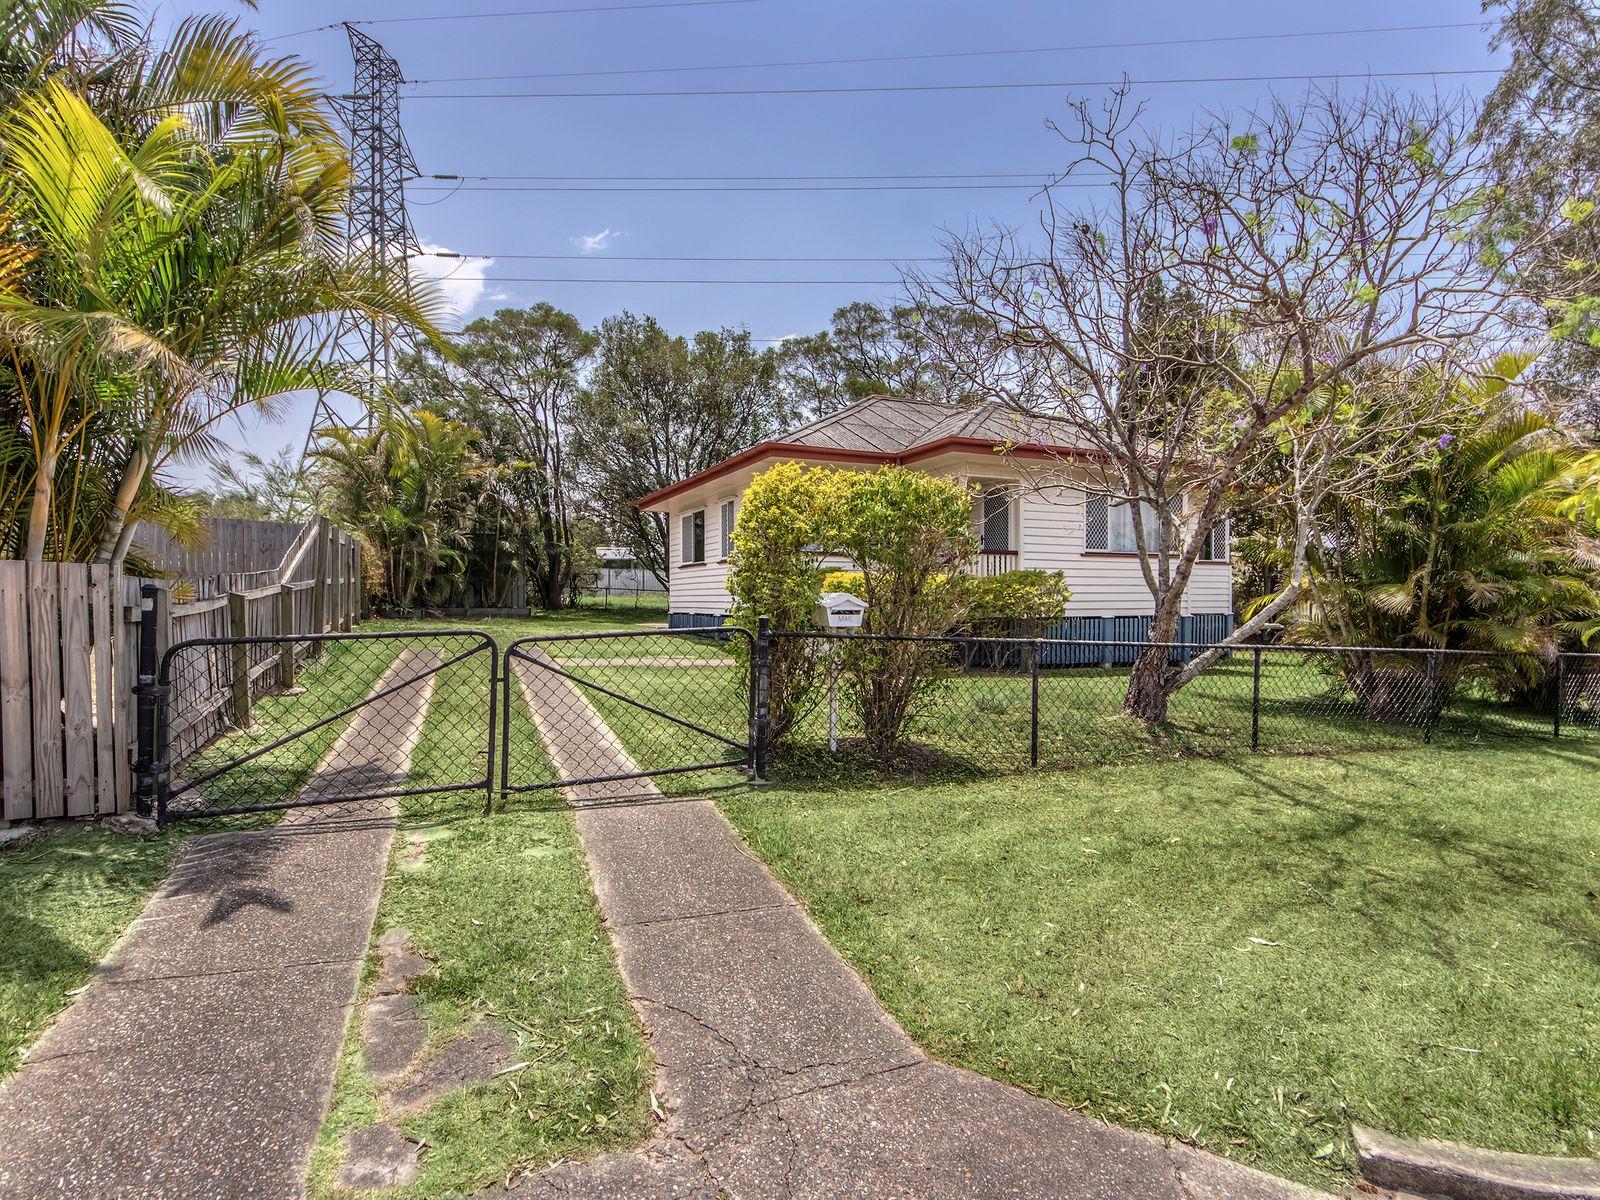 1 Karo Street, Inala, QLD 4077